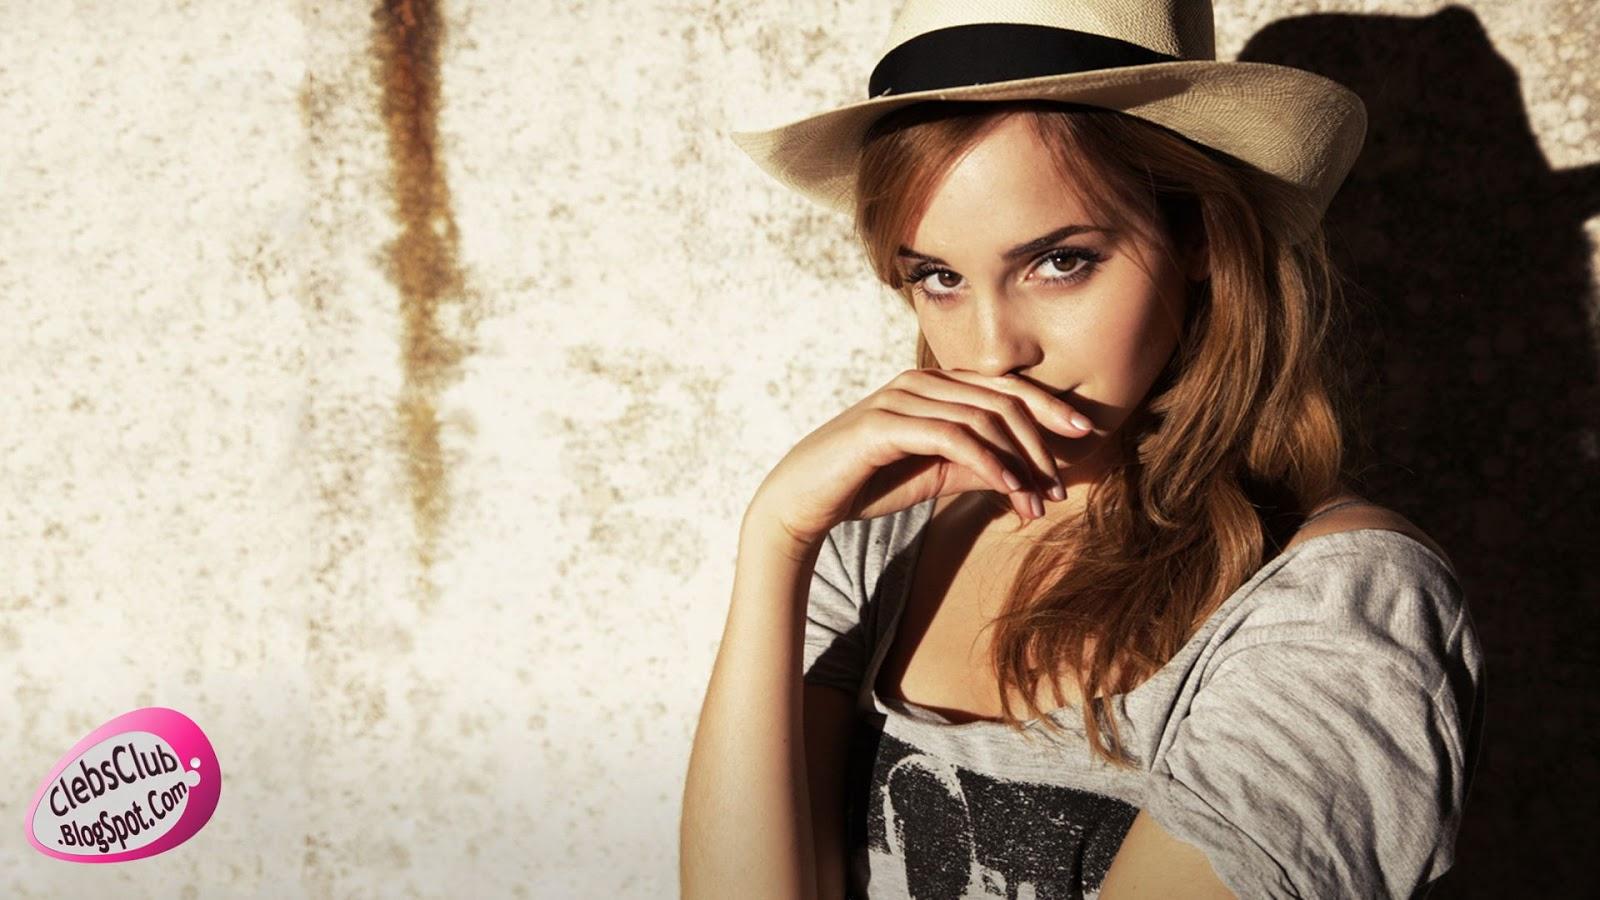 Female celebrity wallpapers hd |Celebrity Club